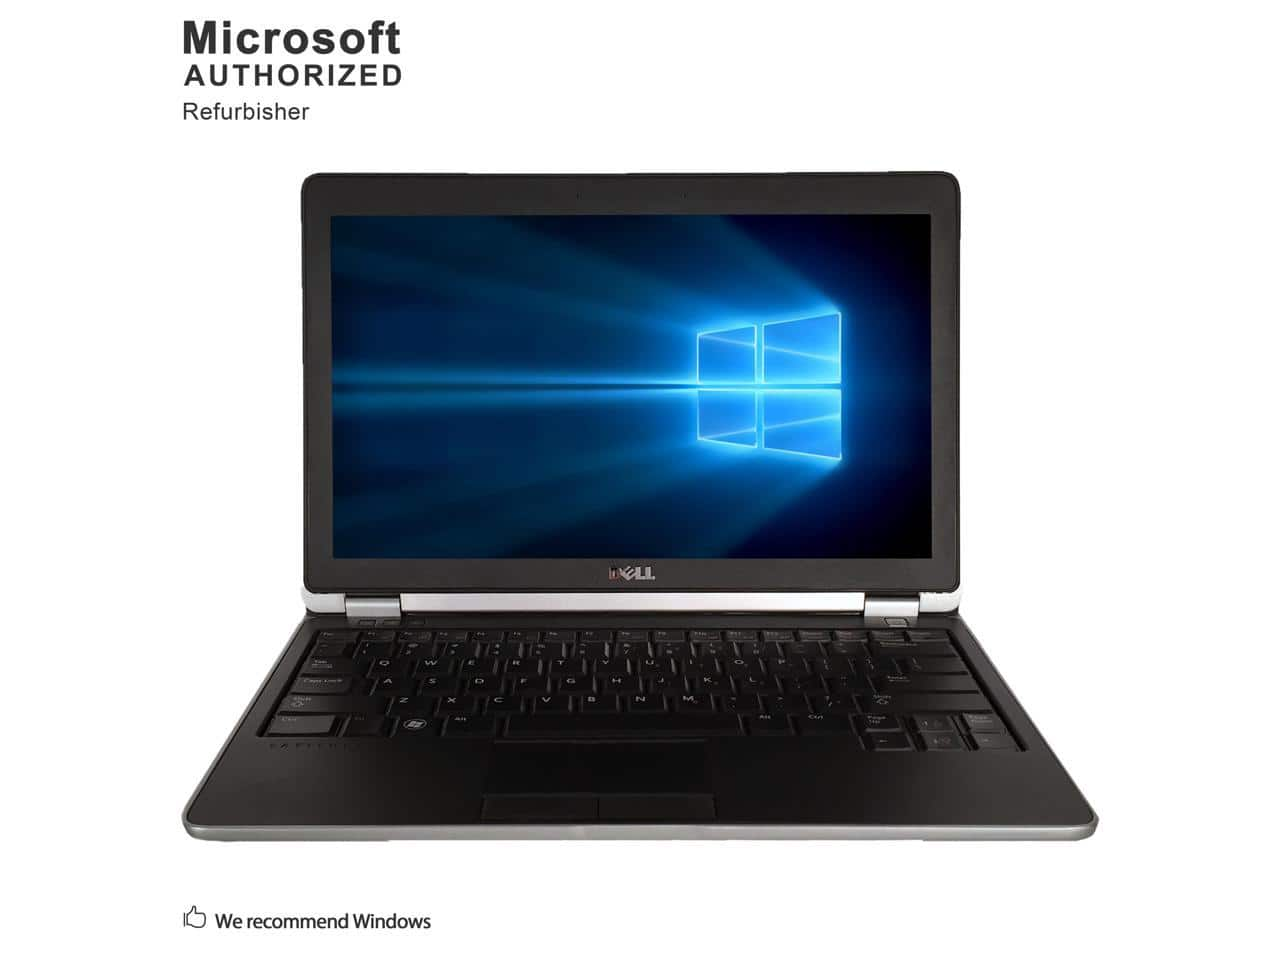 (Newegg via eBay) Manufacturer Refurbished Laptop Promotion: Dell Latitude E6230 - $289 & More + Free Shipping